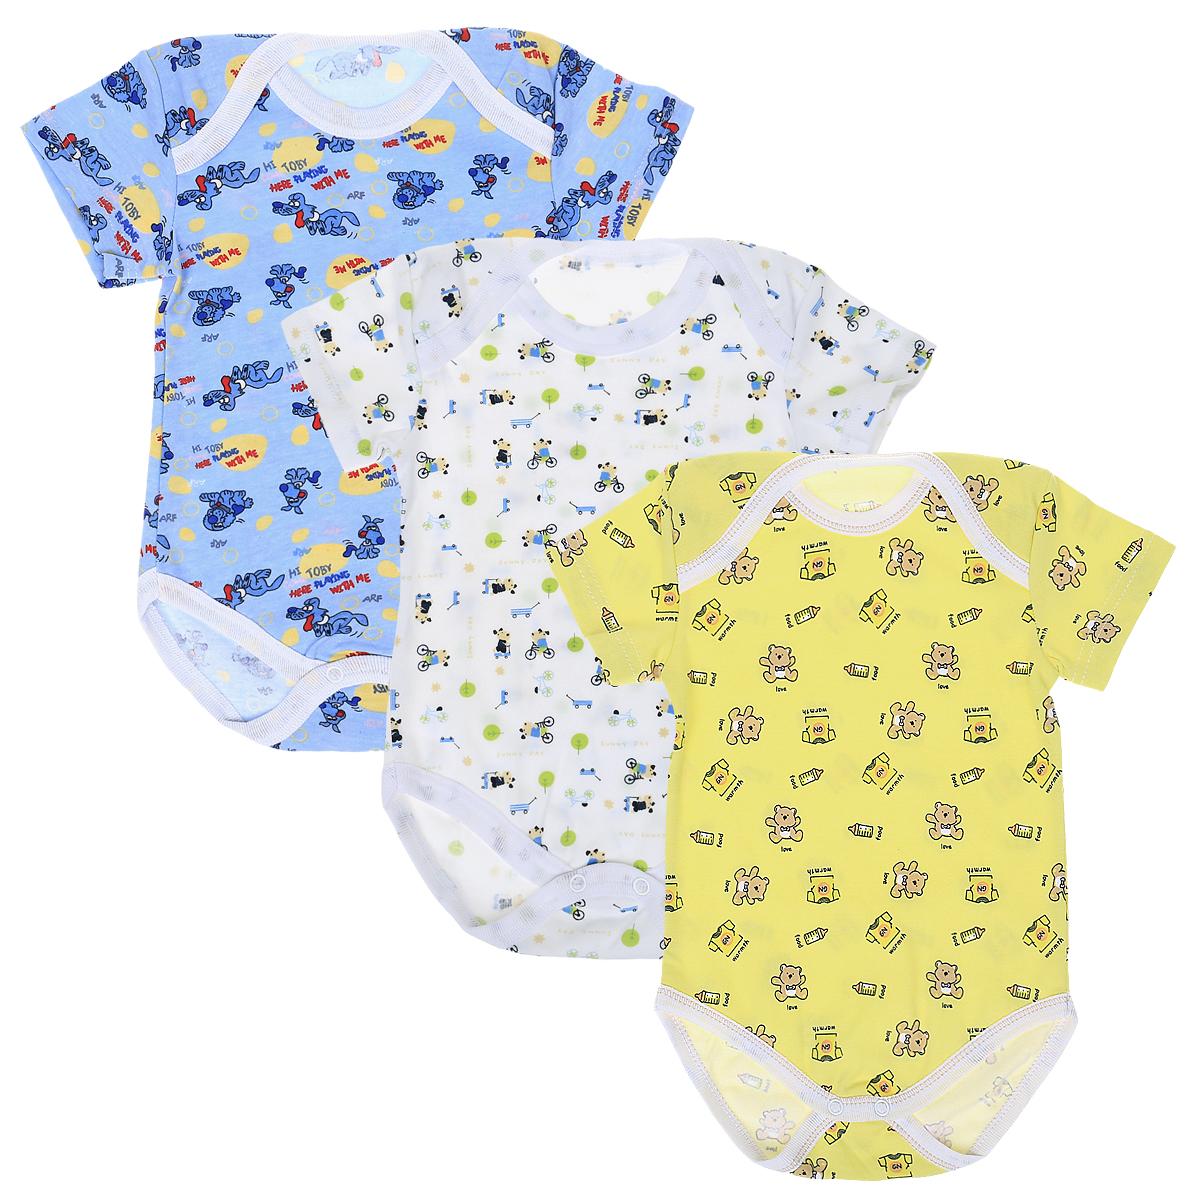 Боди для мальчика Фреш Стайл, цвет: белый, голубой, желтый, 3 шт. 33-315м. Размер 80 боди для мальчика spasilk цвет белый голубой зеленый 3 шт on a7p размер l 6 9 месяцев